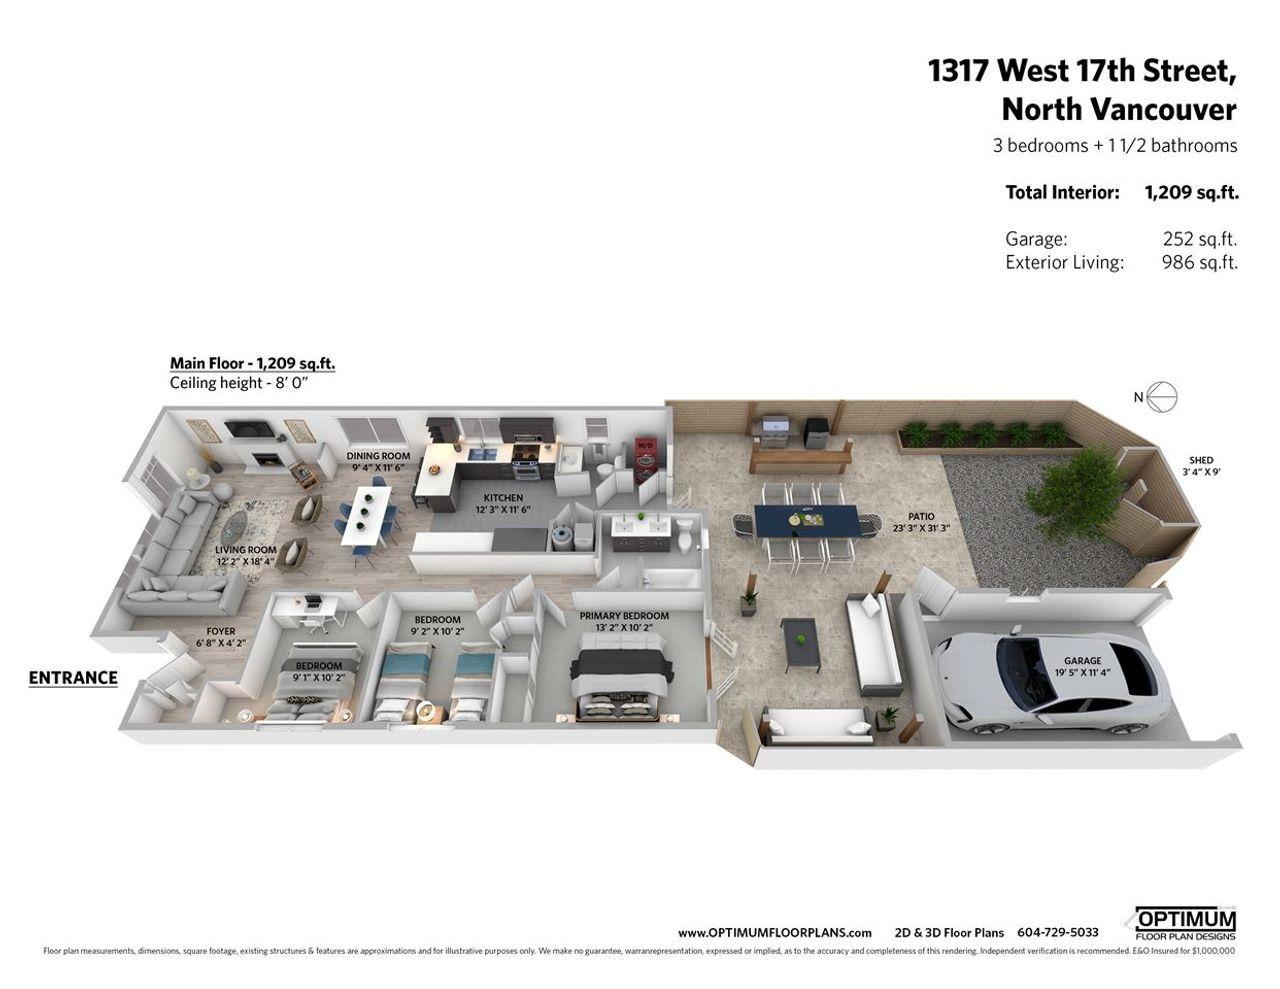 1317-w-17th-street-pemberton-nv-north-vancouver-24 at 1317 W 17th Street, Pemberton NV, North Vancouver